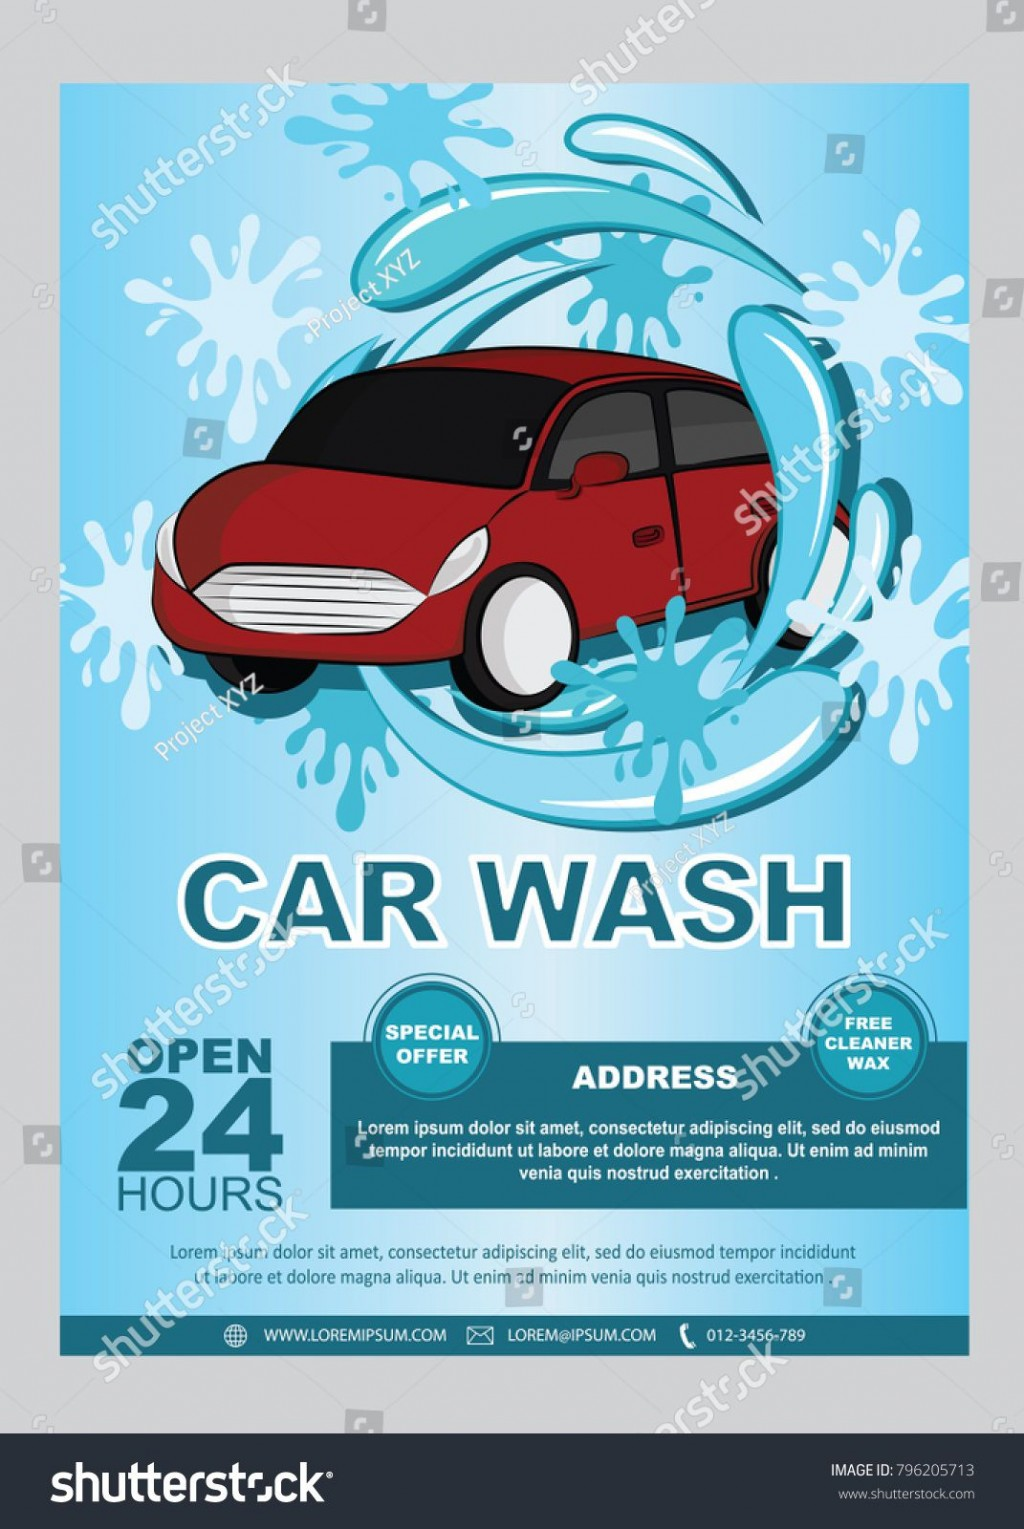 009 Magnificent Car Wash Flyer Template Concept  Free Fundraiser DownloadLarge